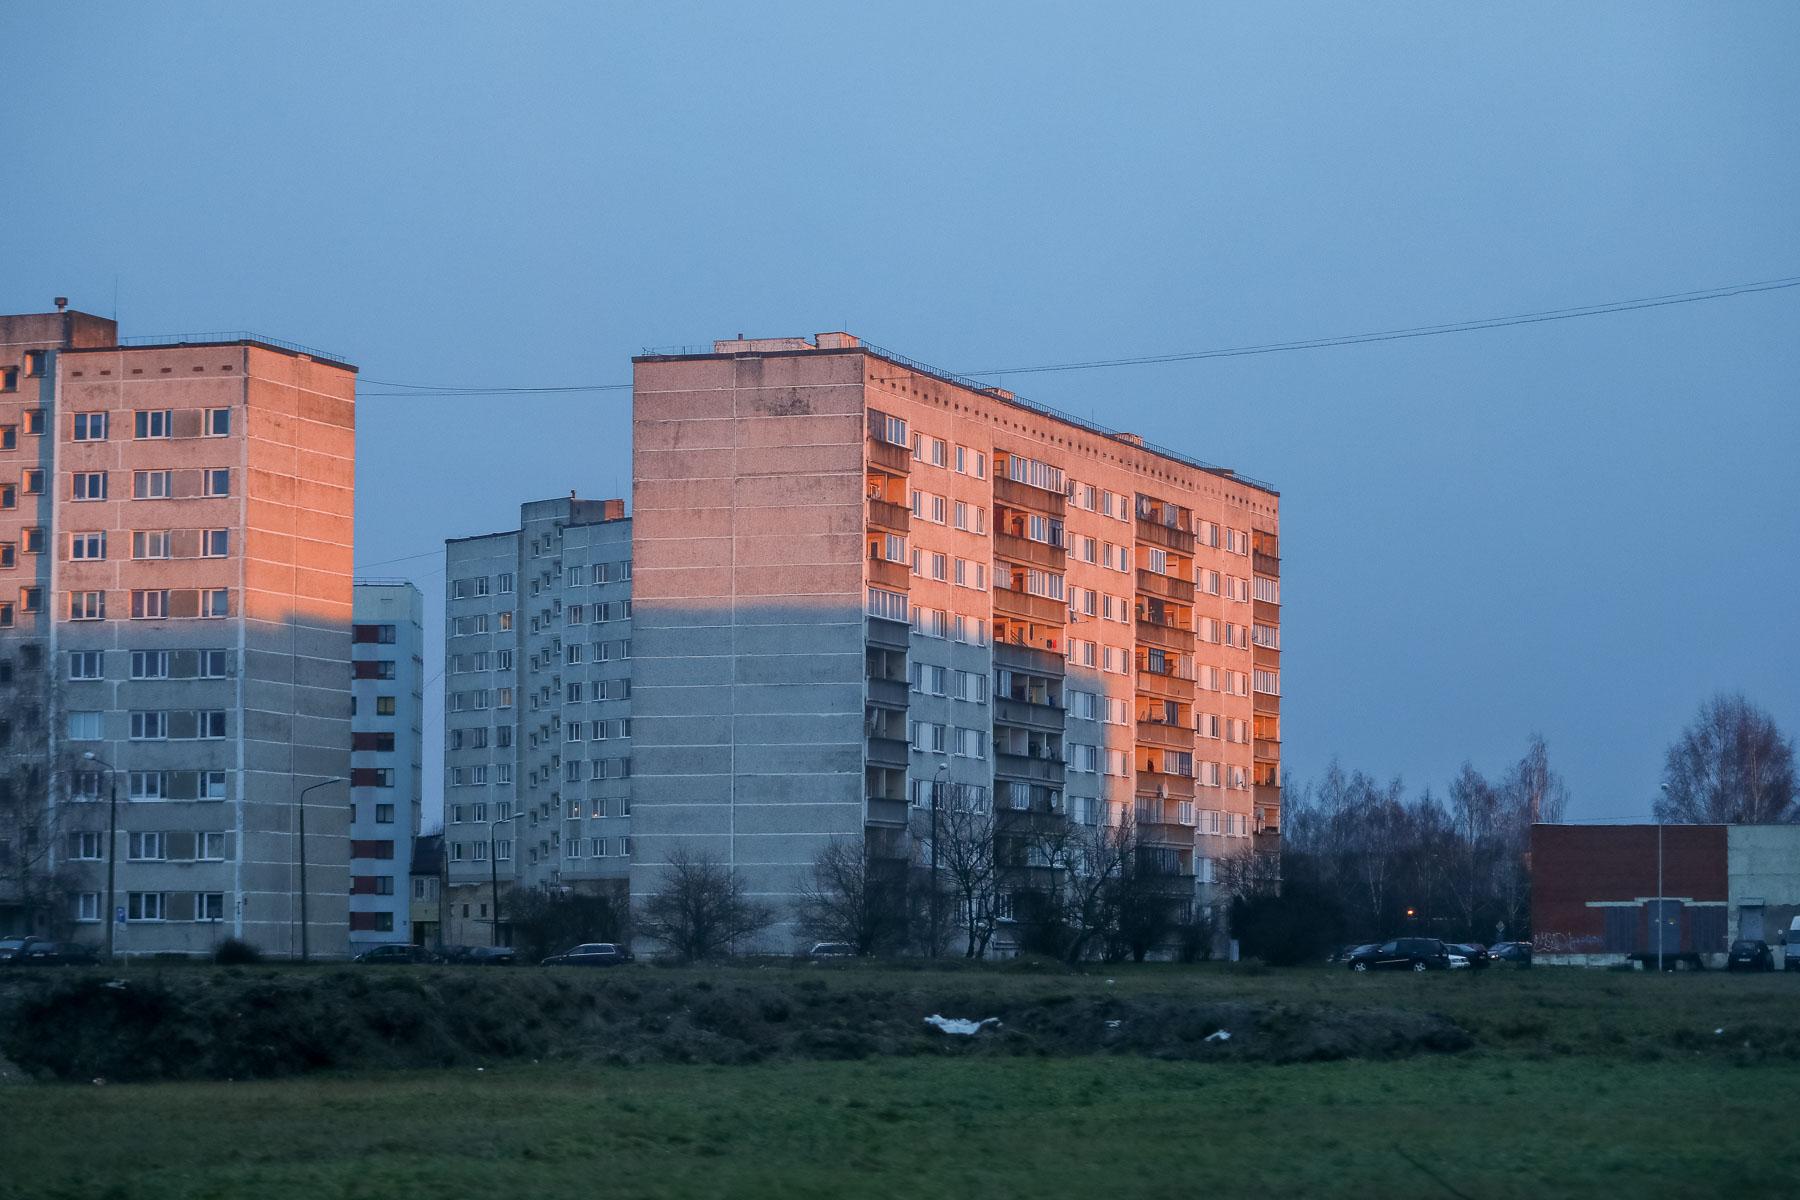 Landscape-cityscape-photography-jelgava-latvia-blocs-blocks-flat-post-soviet--Советские-квартиры-спальный-район-Латвия-город-фотограф-natalia-smith-photography-0084.jpg